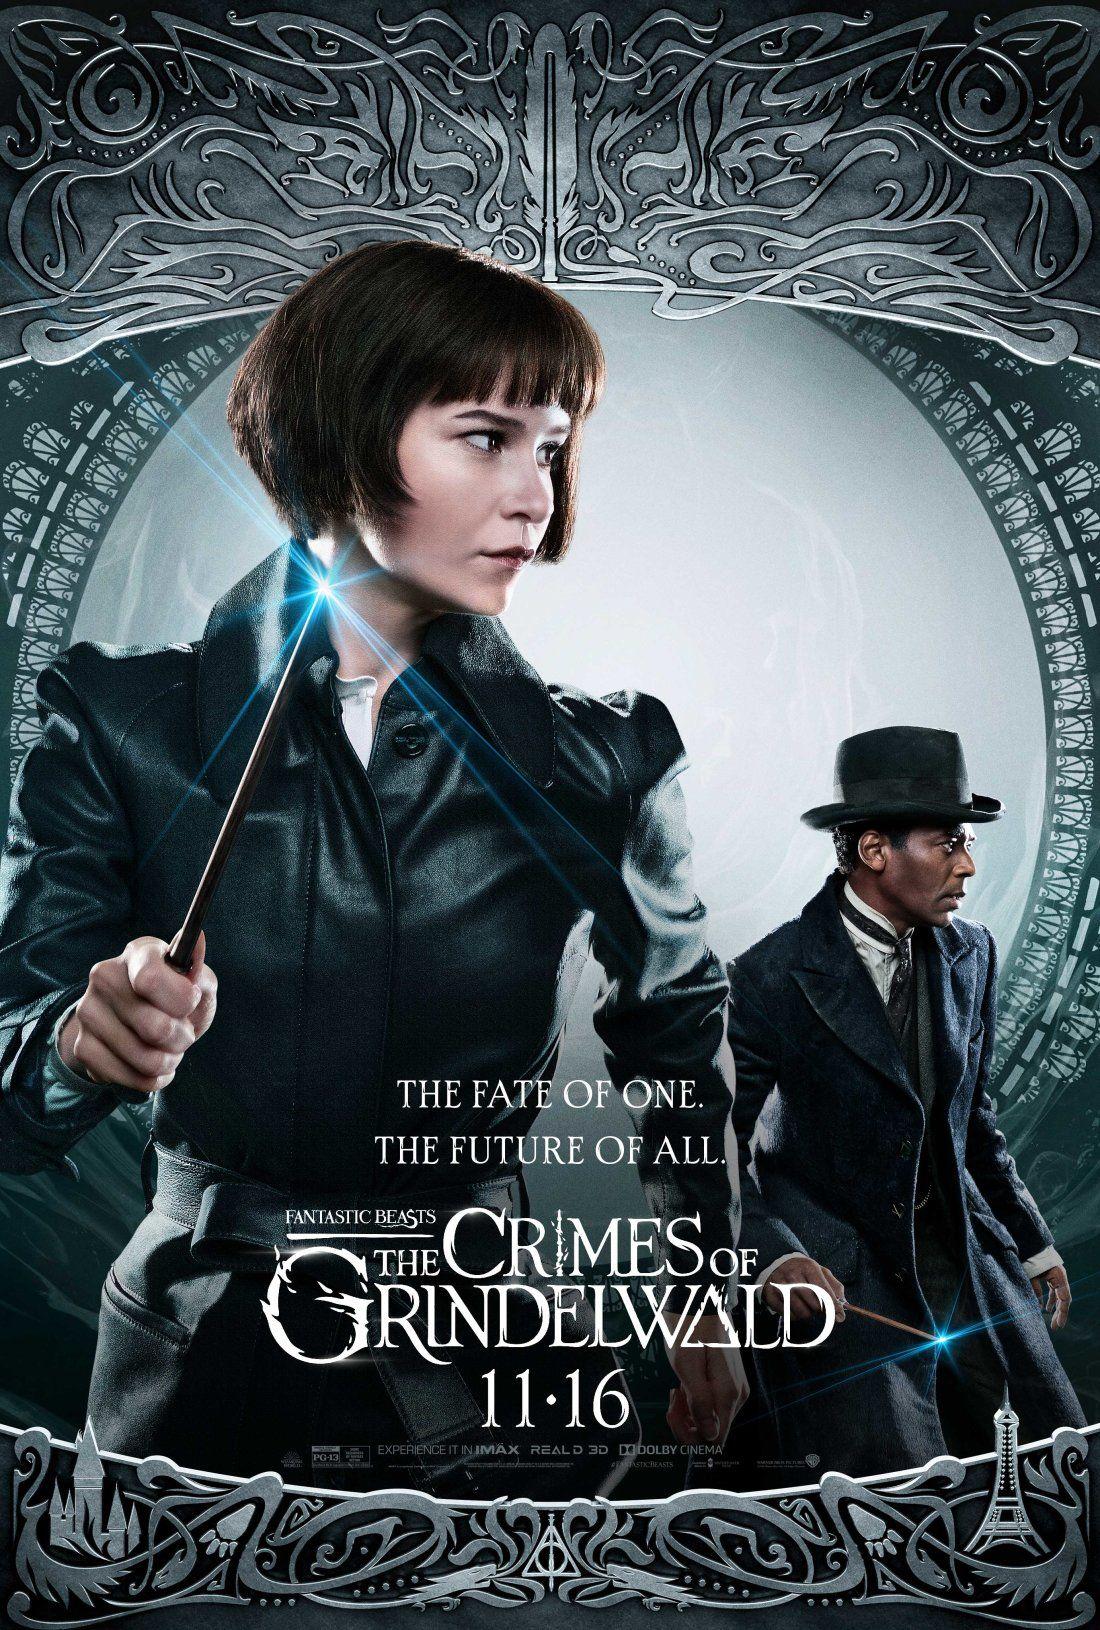 Regarder Animaux Fantastiques 2 Les Crimes De Grindelwald En Streaming New Fantastic Beasts The Crimes Of Grindelwald Posters Revealed Les Animaux Fantastiques Animaux Fantastiques Les Animaux Fantastiques 2